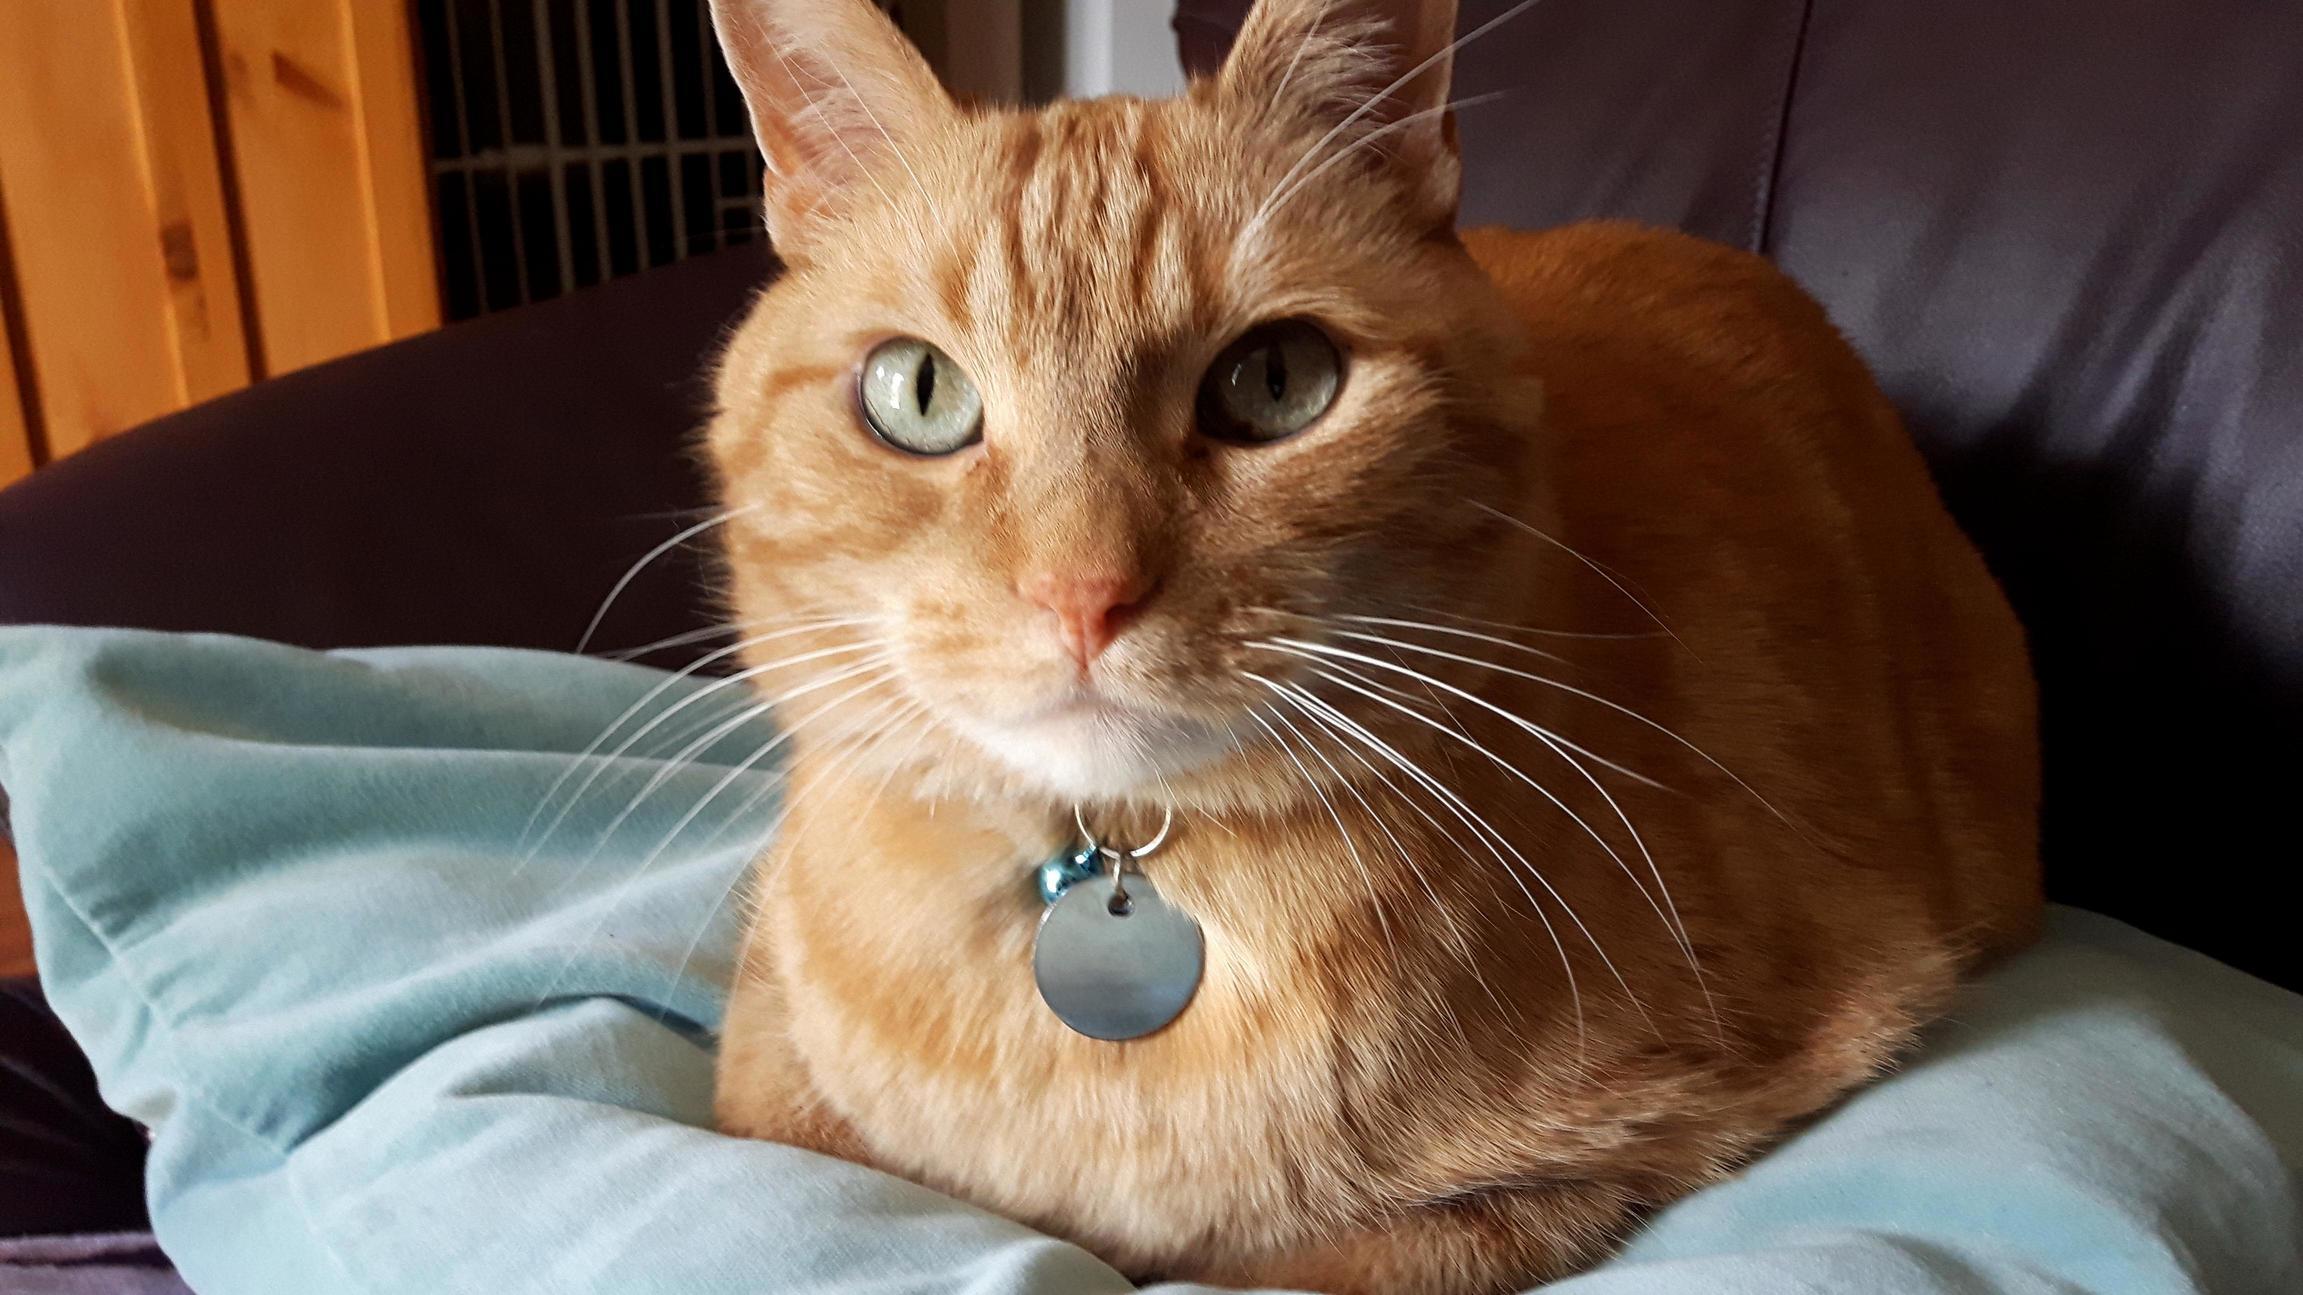 Loafcat awaits his pets